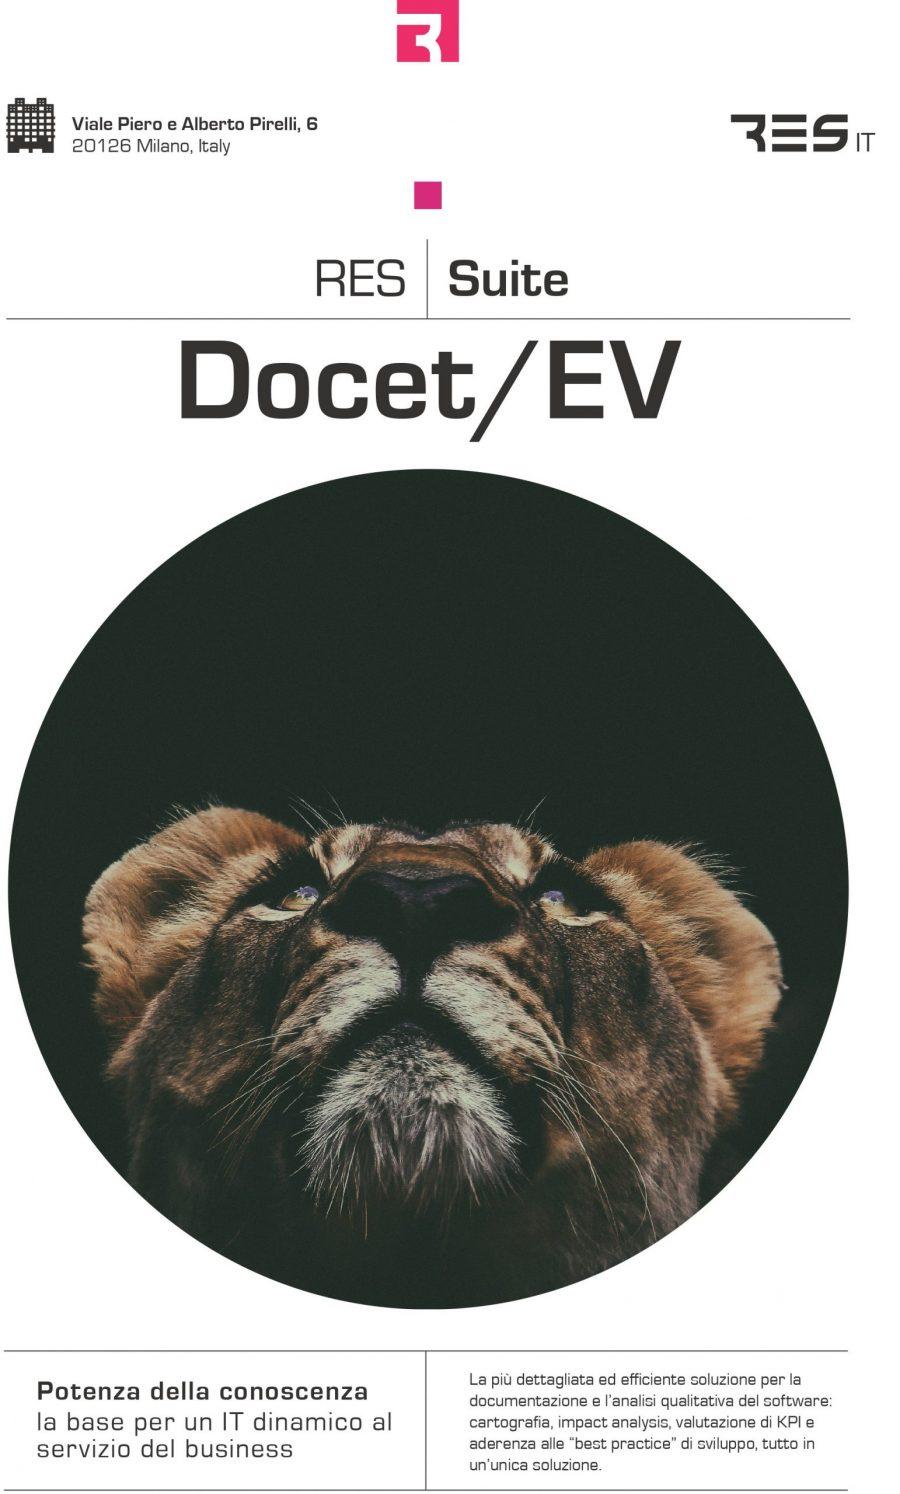 Docet/EV